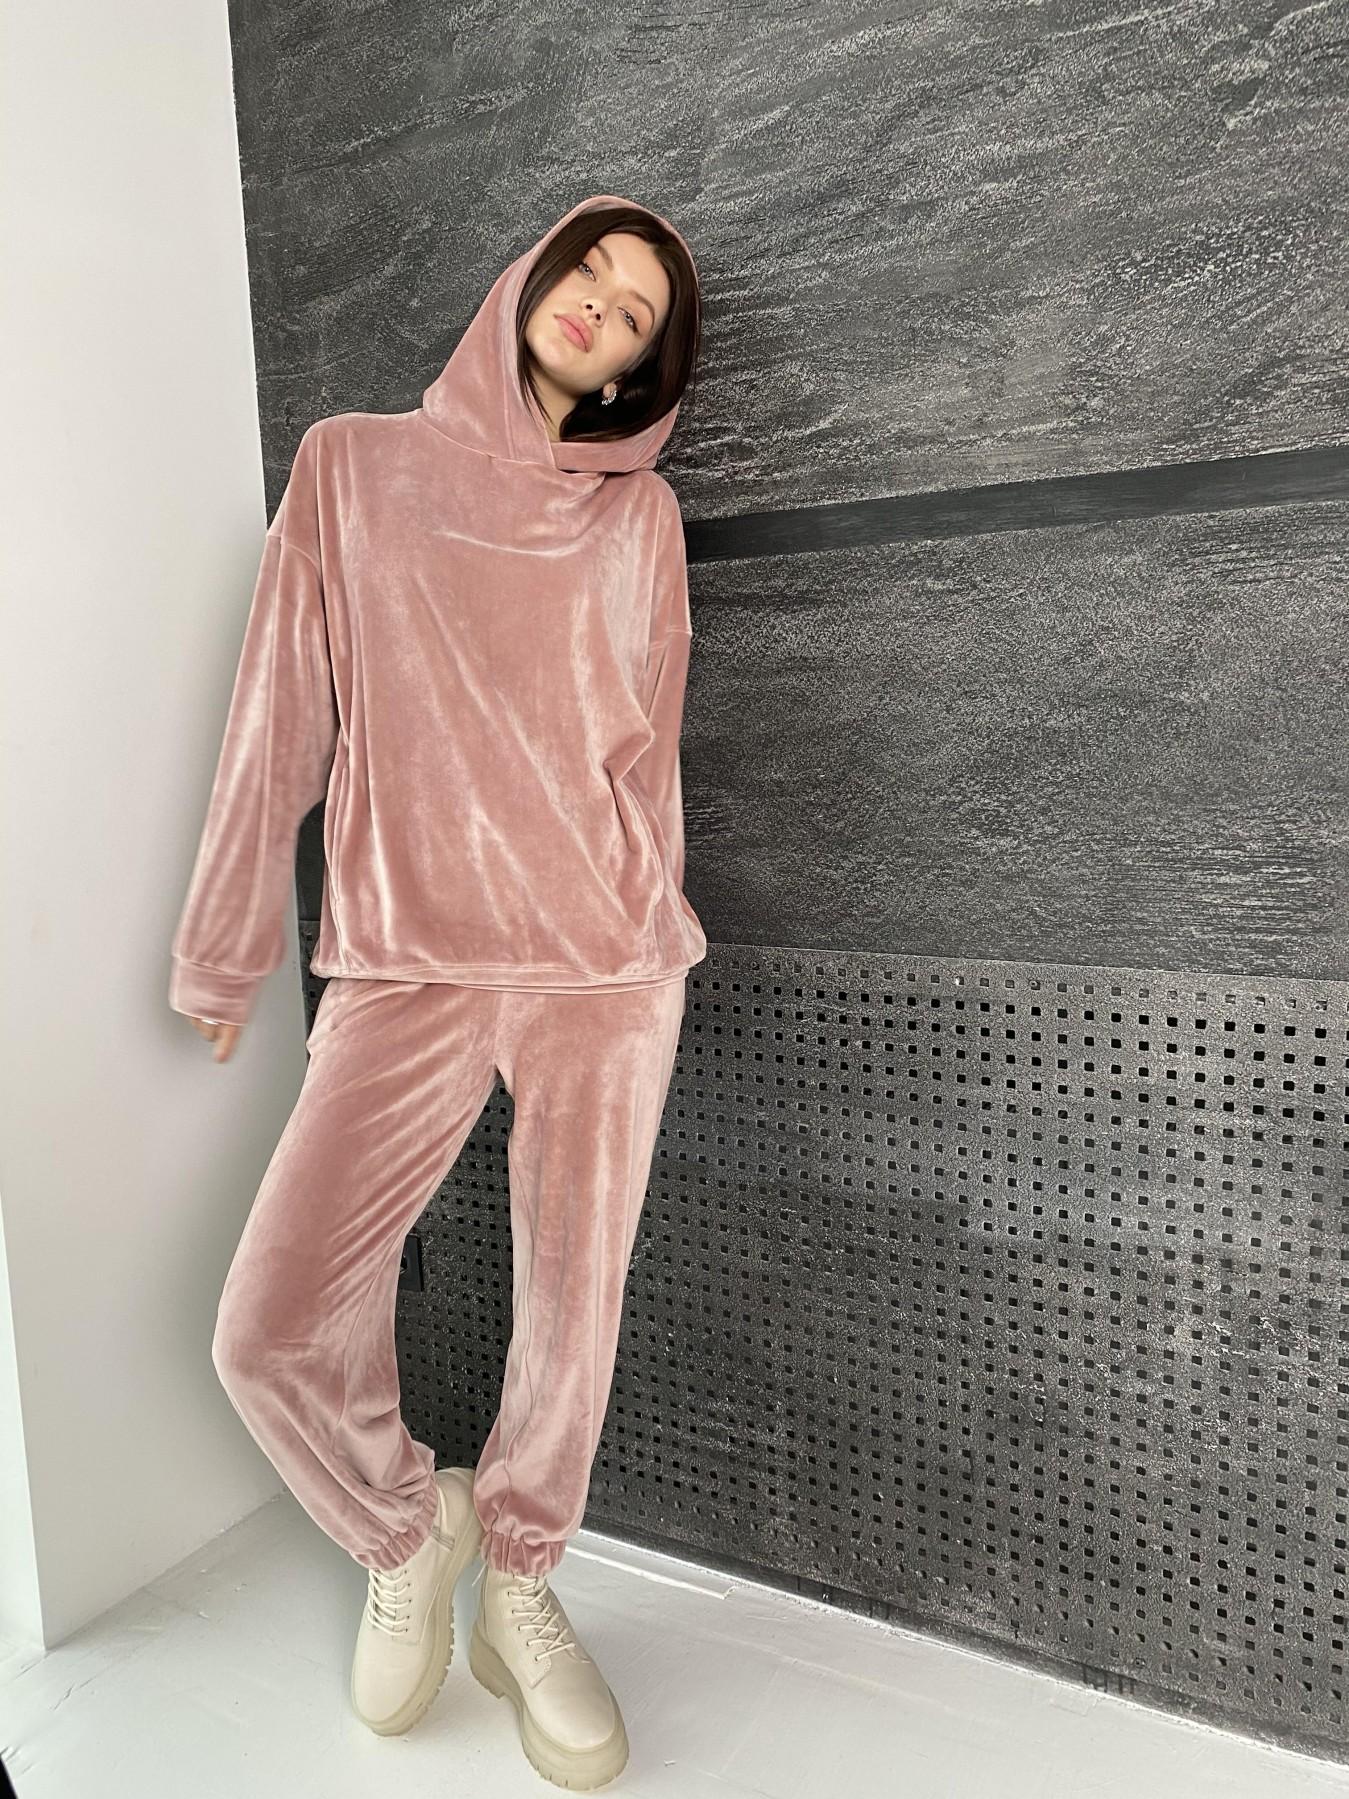 Марион Oversize  костюм из велюра 10690 АРТ. 47112 Цвет: Пудра - фото 4, интернет магазин tm-modus.ru